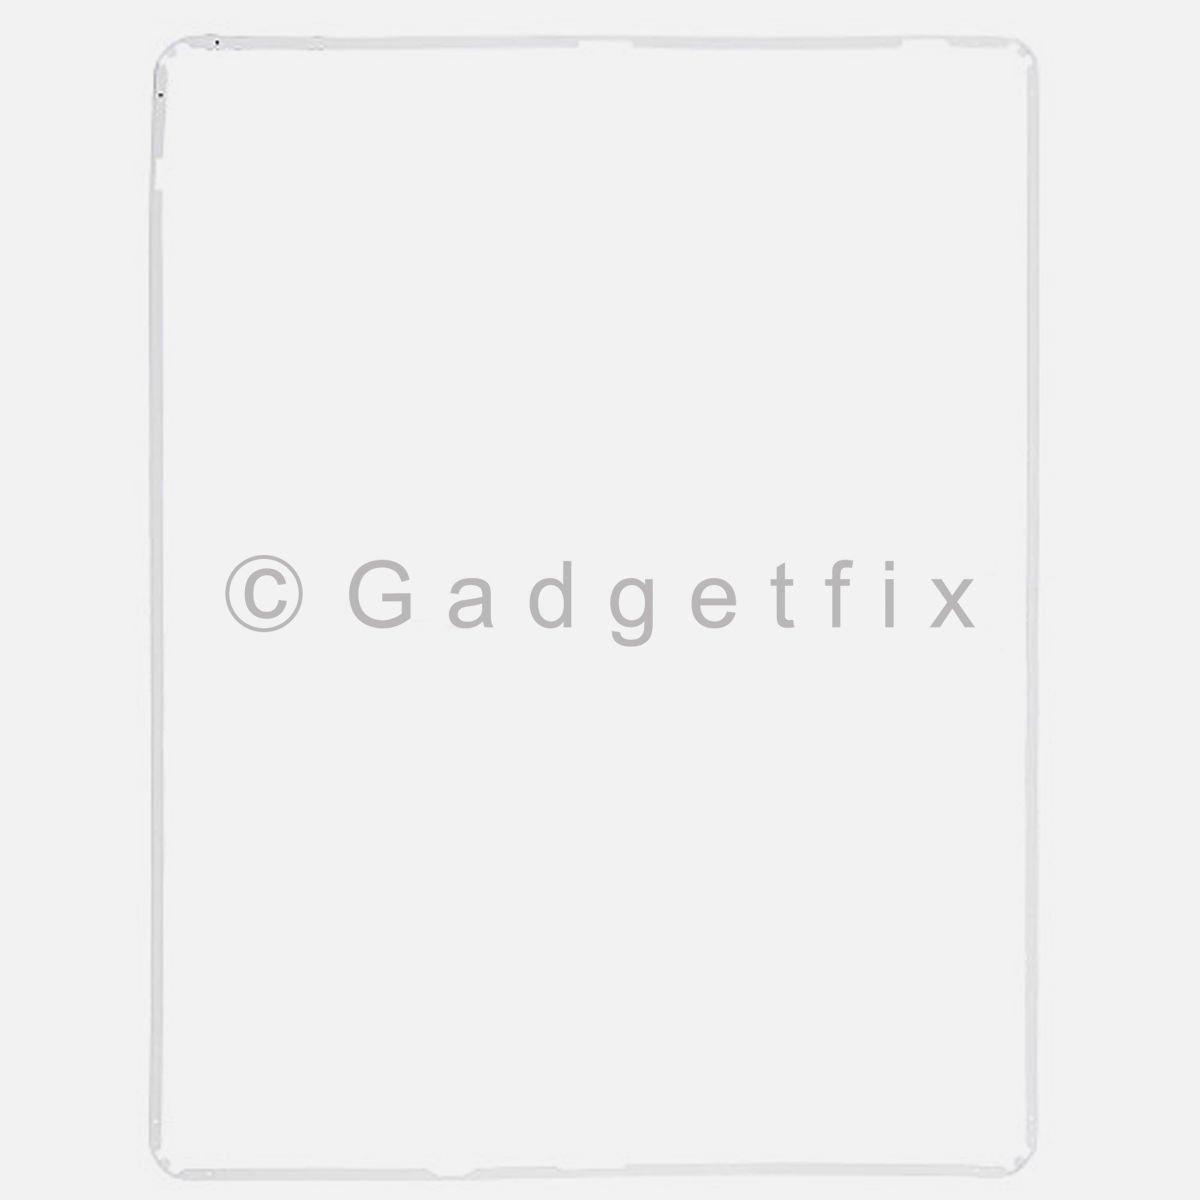 iPad2 Replacement Parts | iPad 2 Accessories | GadgetFix